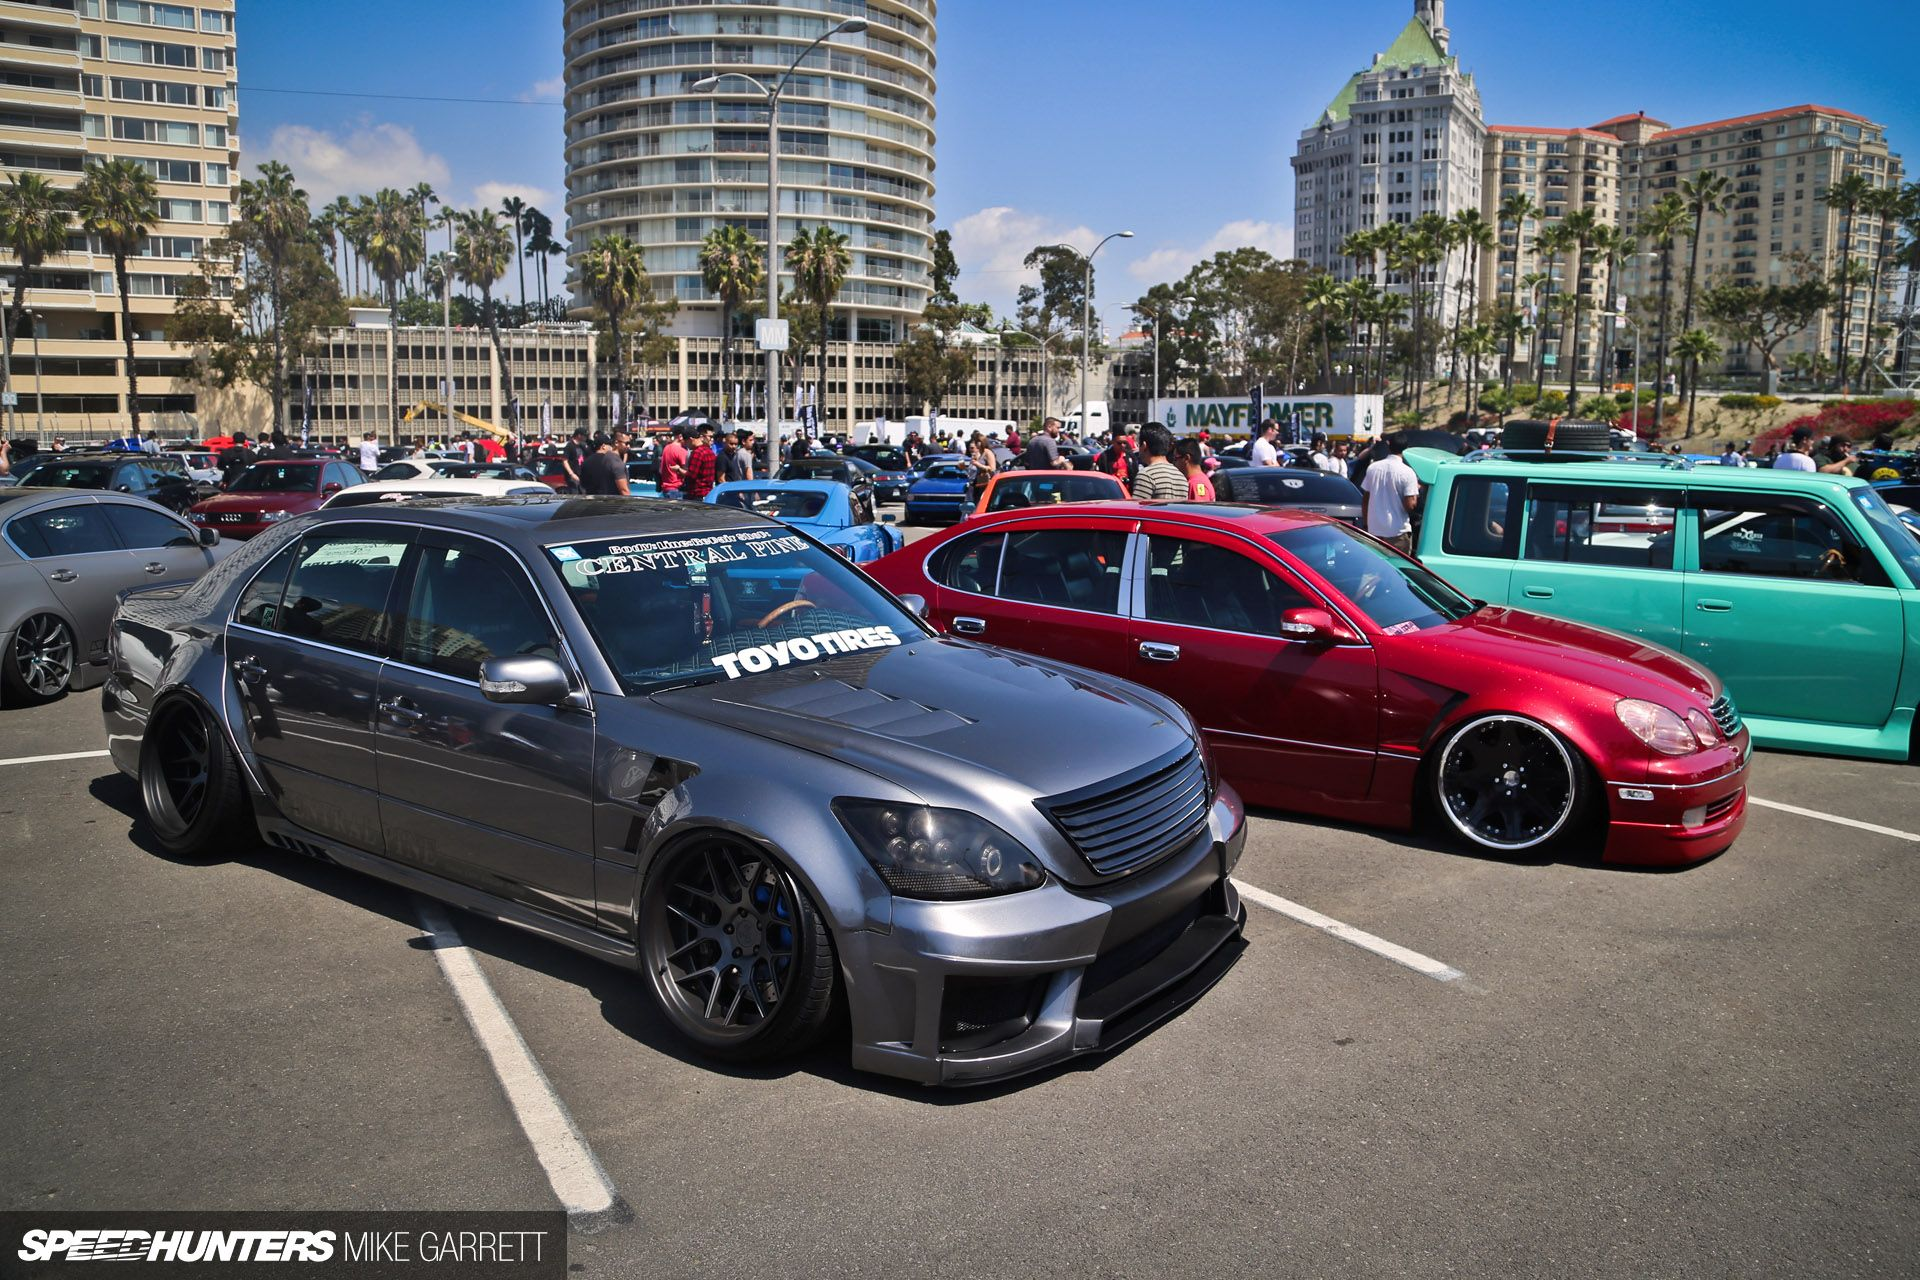 #LEXUS | Japanese cars, Lexus, Car manufacturers